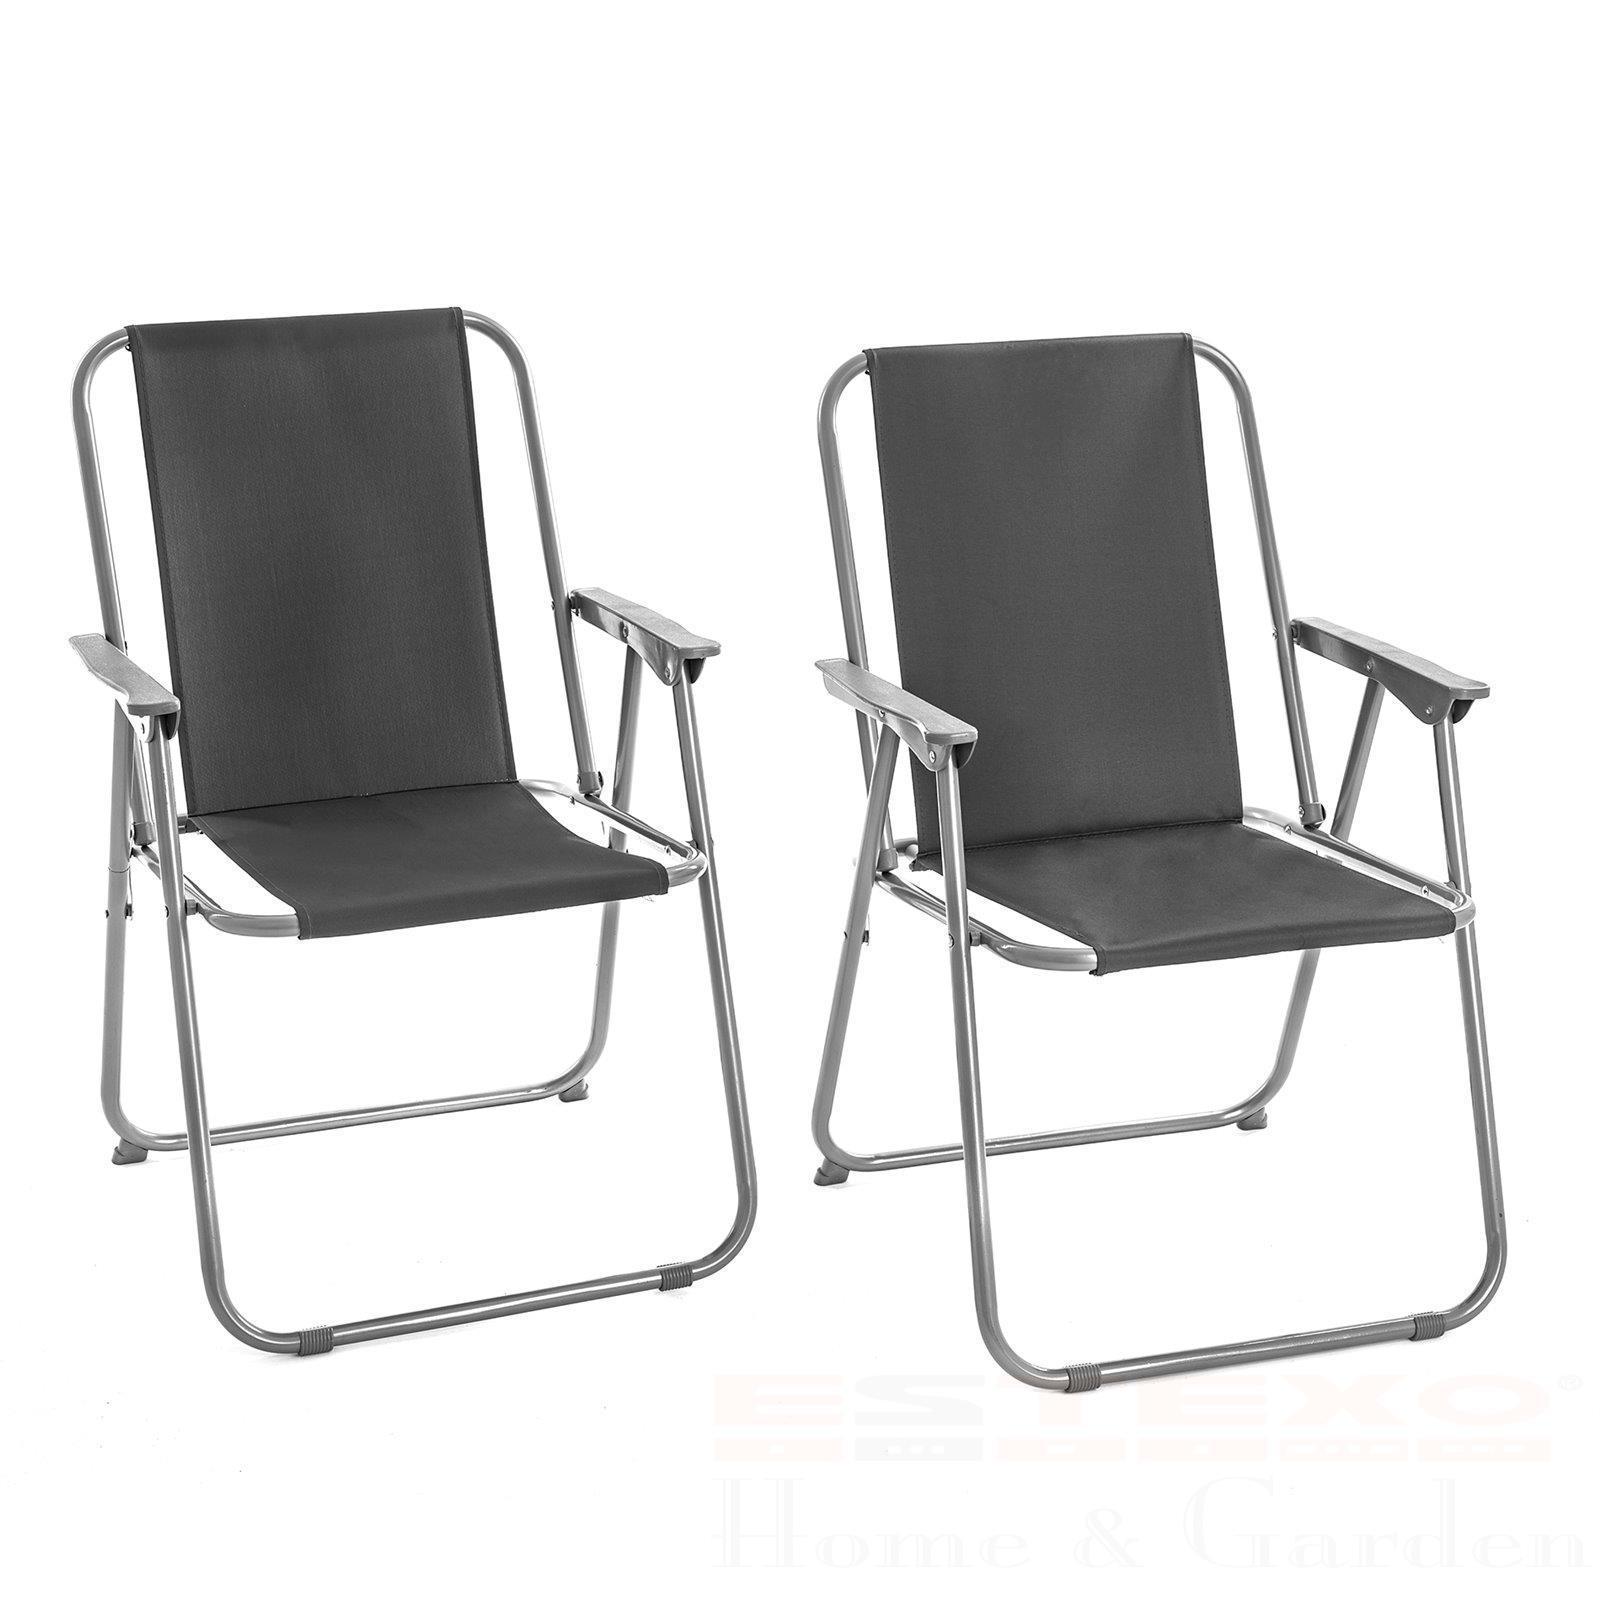 2er Set Camping Stuhl Klappstuhl Angelstuhl Anglerstuhl faltbar ultraleicht